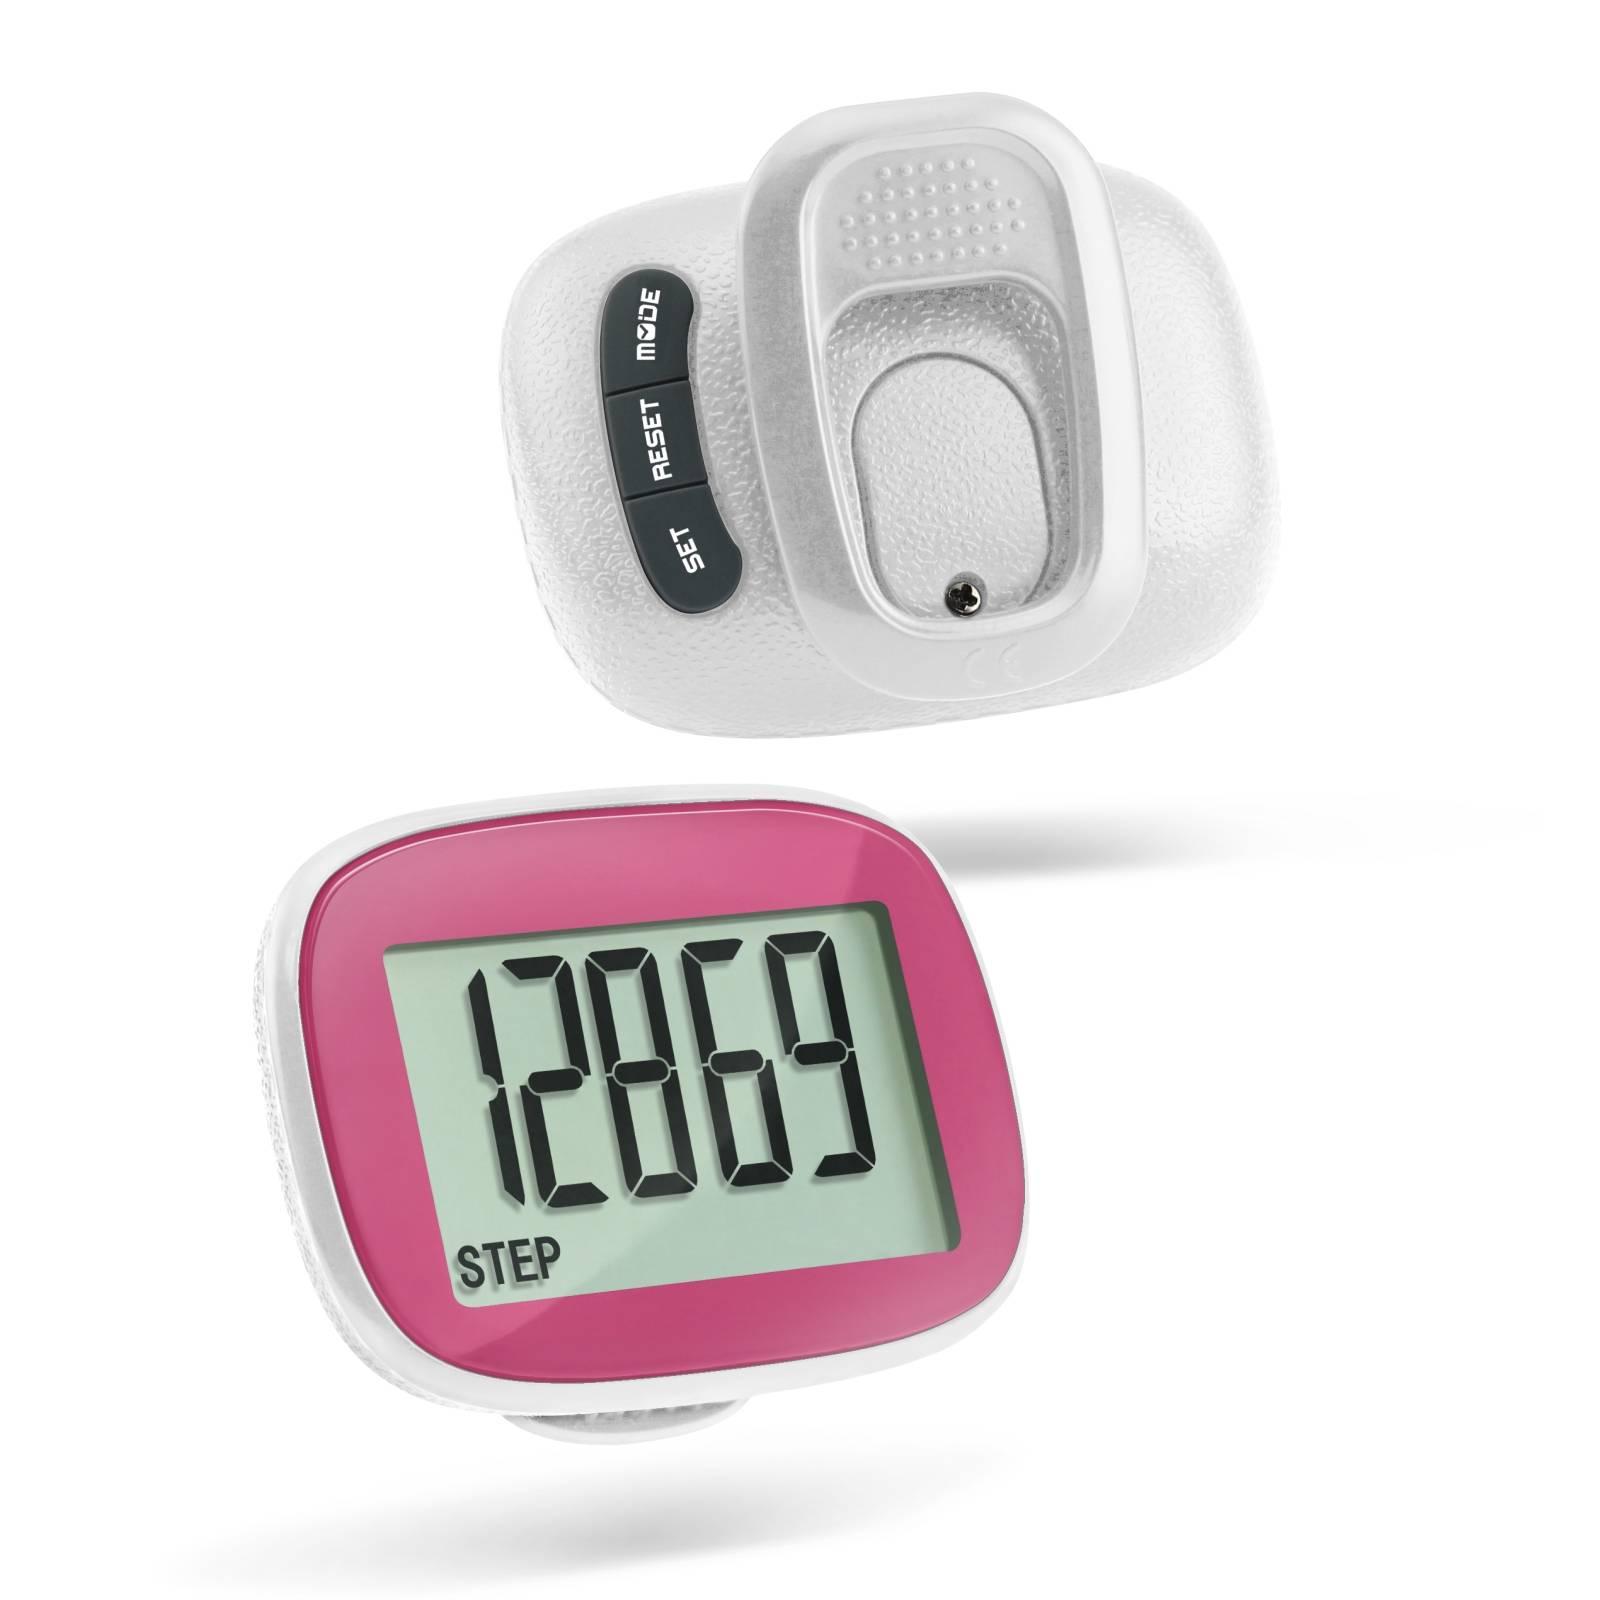 AP-J9880 3D Calorie pedometer